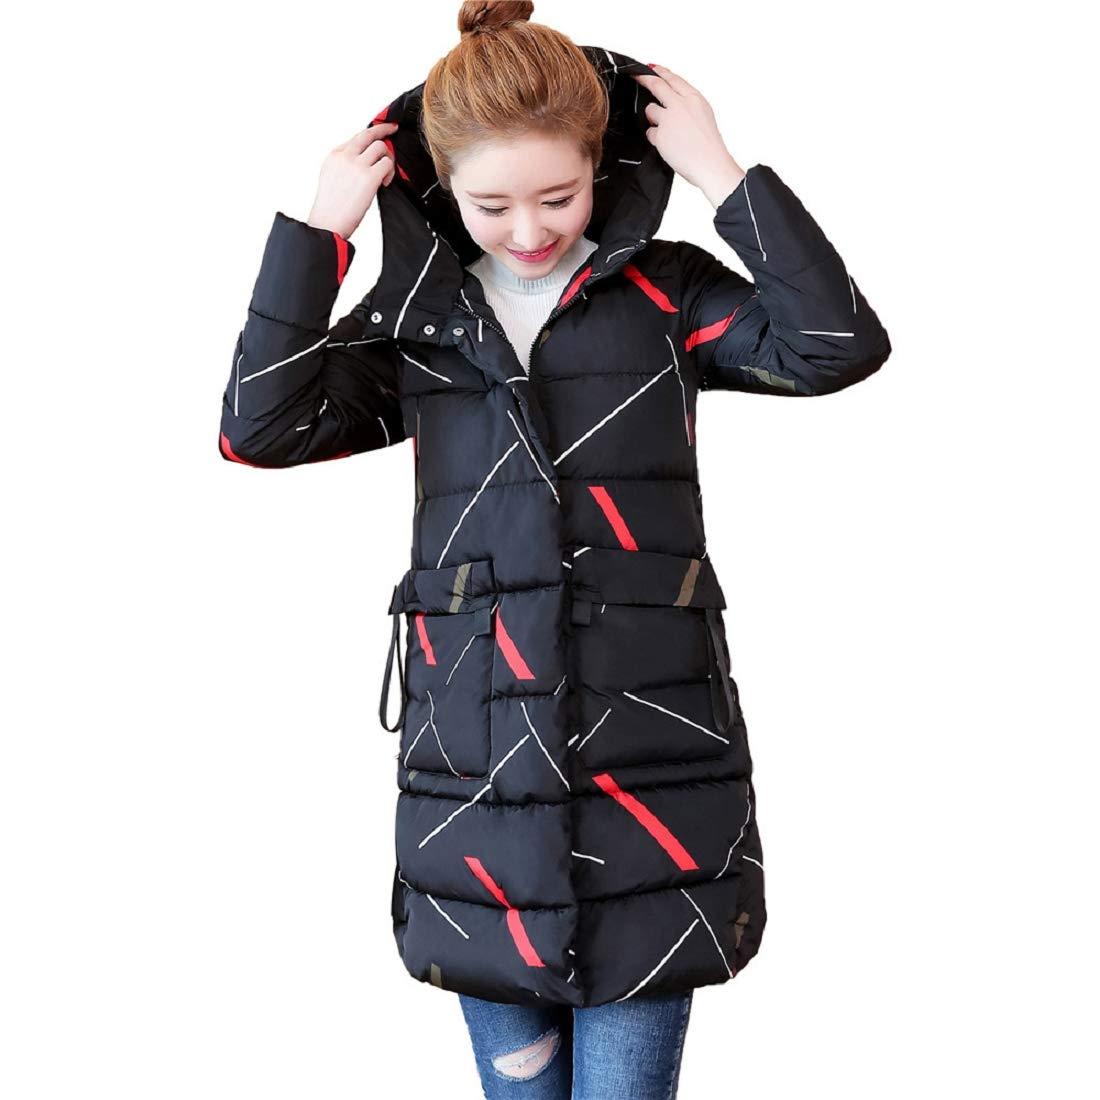 f58bc9246f8 Amazon.com  GONKOMA Women Winter Warm Fur Hooded Coats Parka Long Thicken  Overcoat Cardigan Jackets Outerwear  Clothing